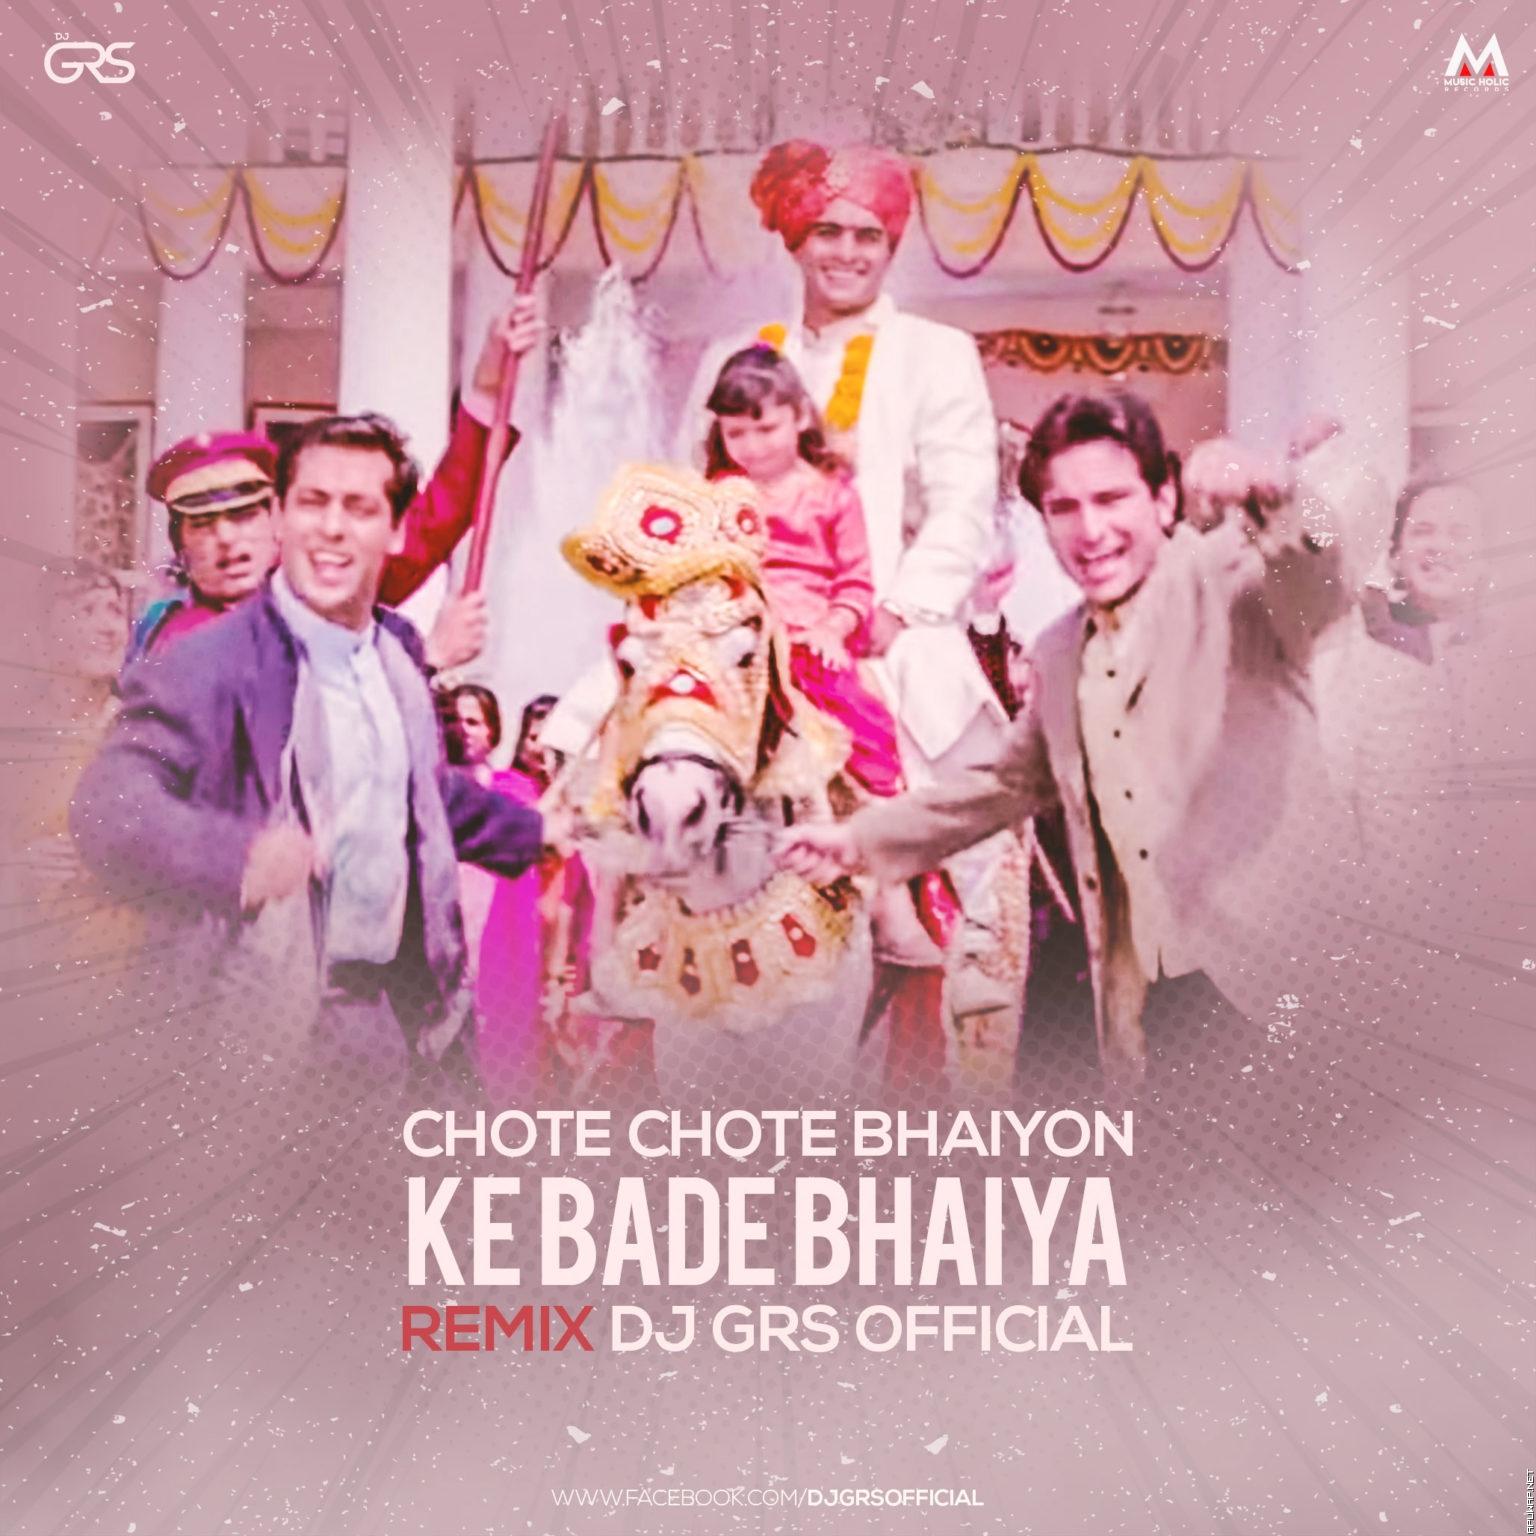 CHOTE CHOTE BHAIYO KE – DJ GRS REMIX.mp3